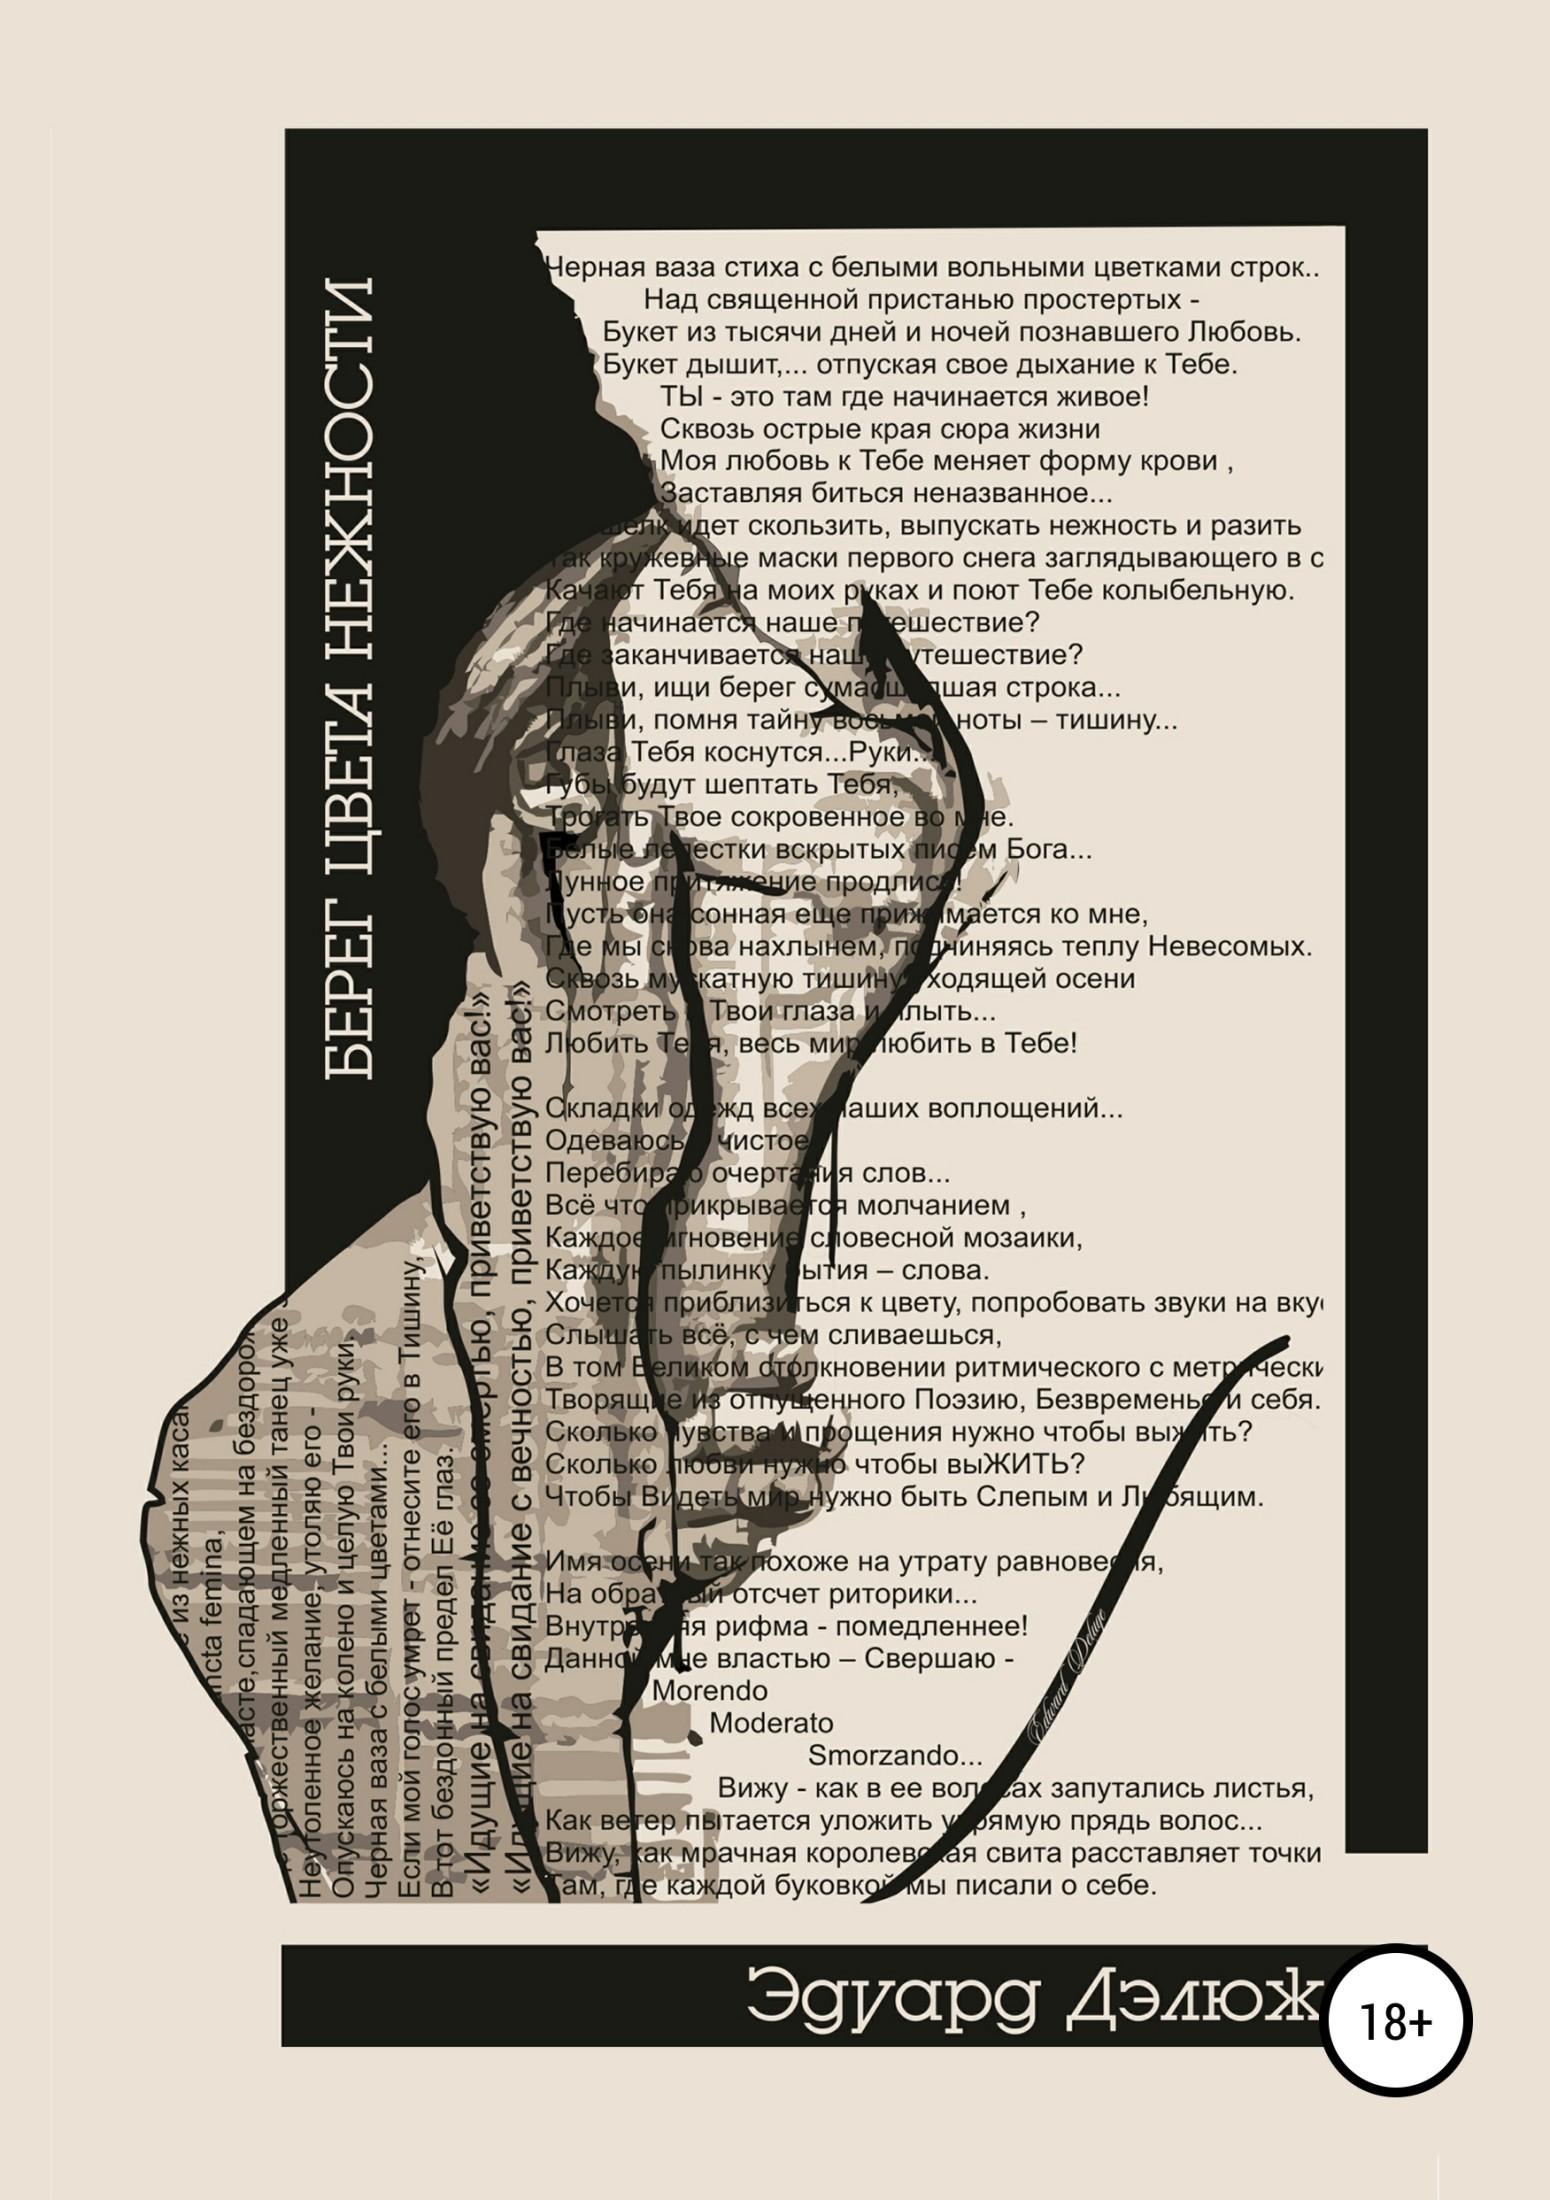 Эдуард Андреевич Дэлюж Берег цвета нежности антипенко эдуард сафронович строки поэзии